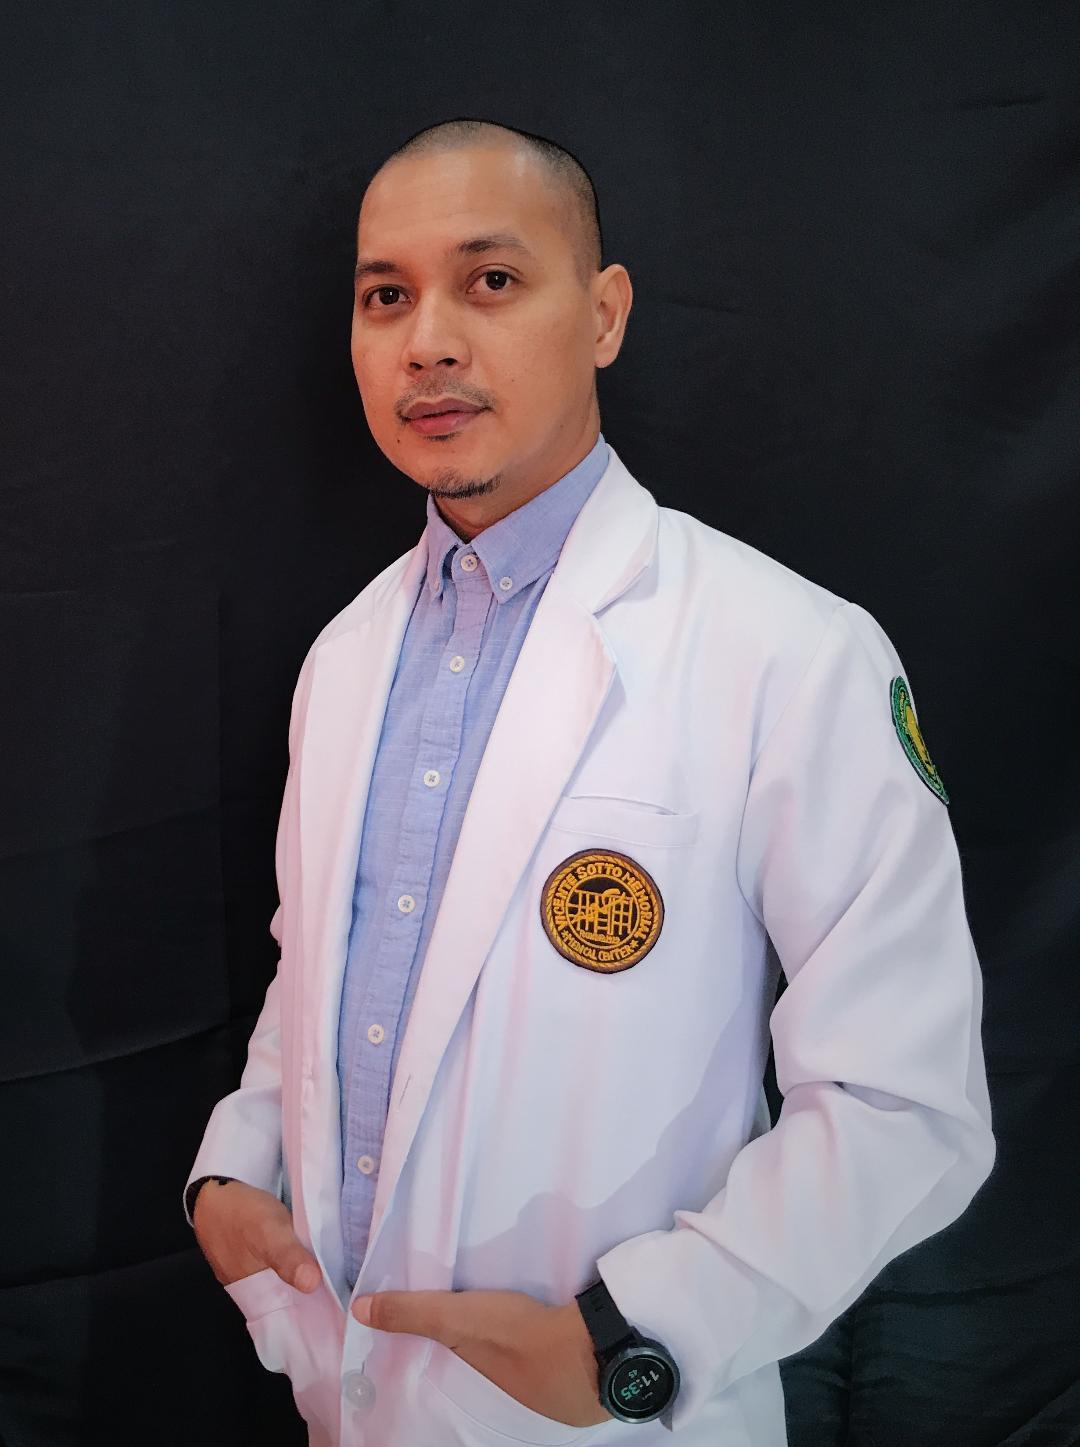 Rian John Pableo, MD, DPSP